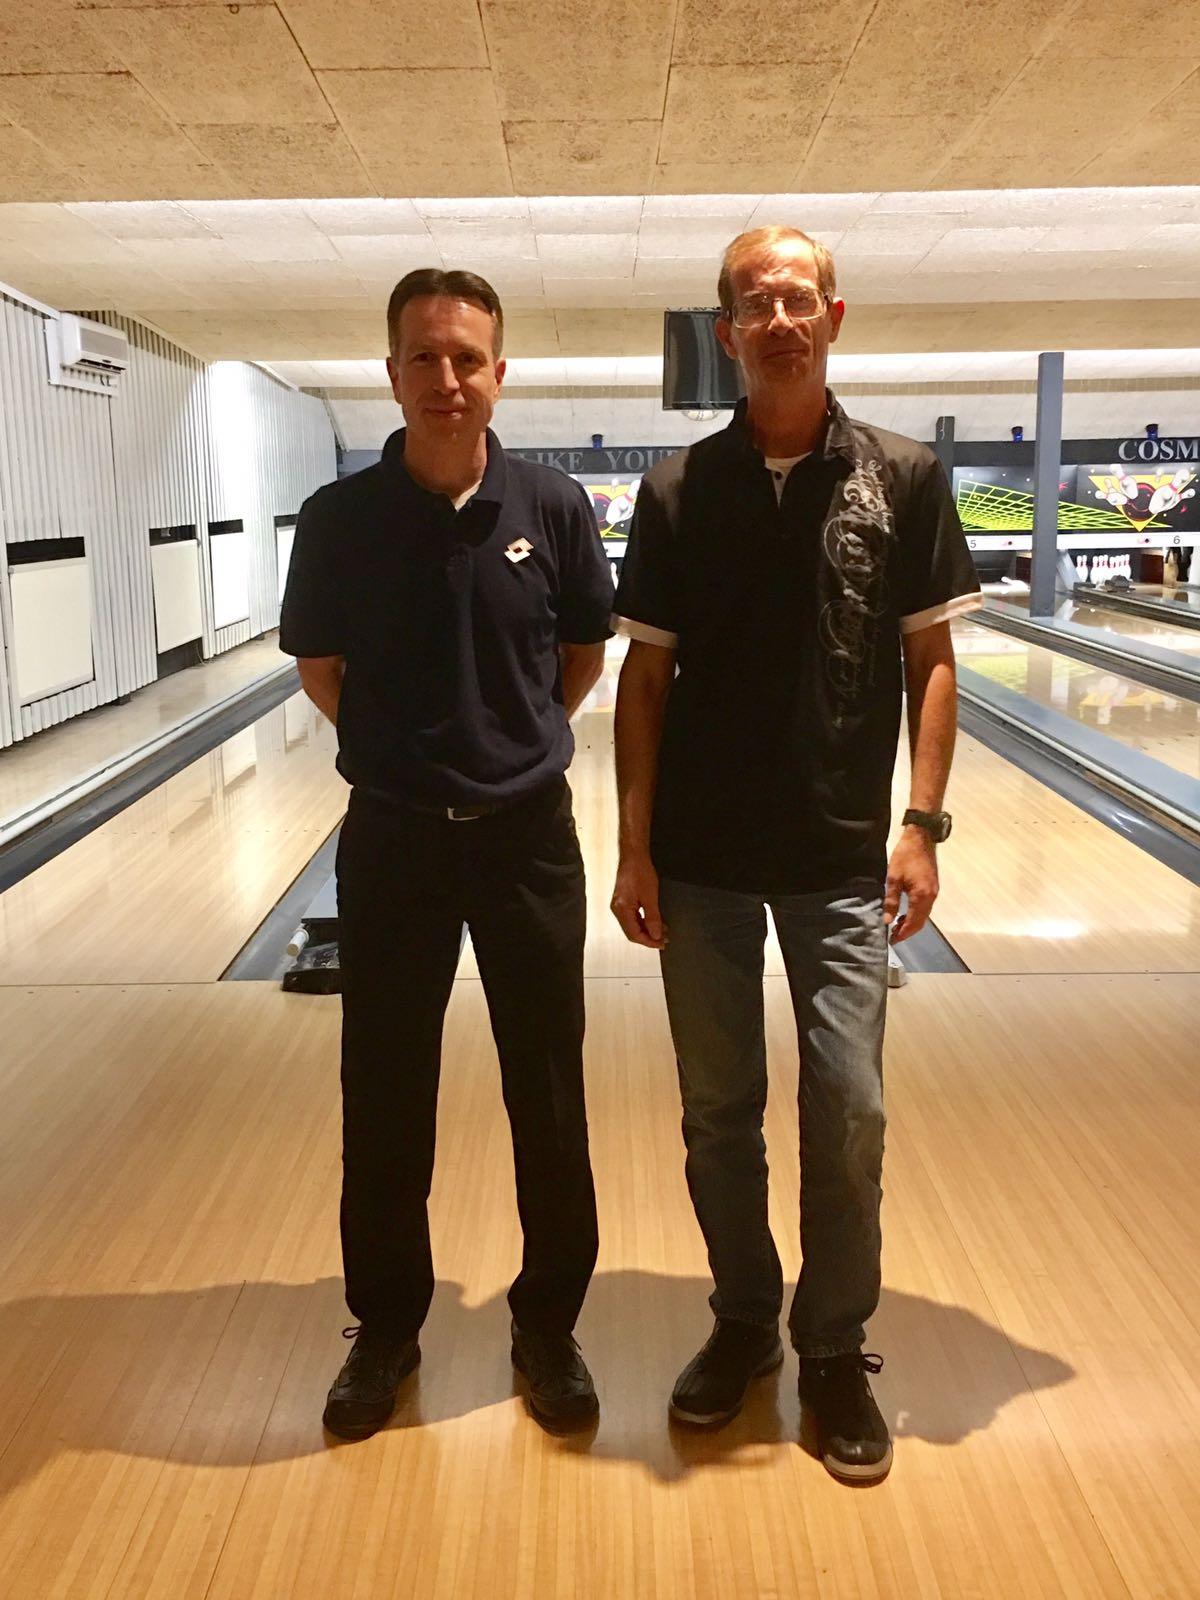 http://www.bowlingverenigingheiloo.nl/wall_of_fame/foto's/2018_0503-300Game E.J.Bodemann en M.Snelting.jpg